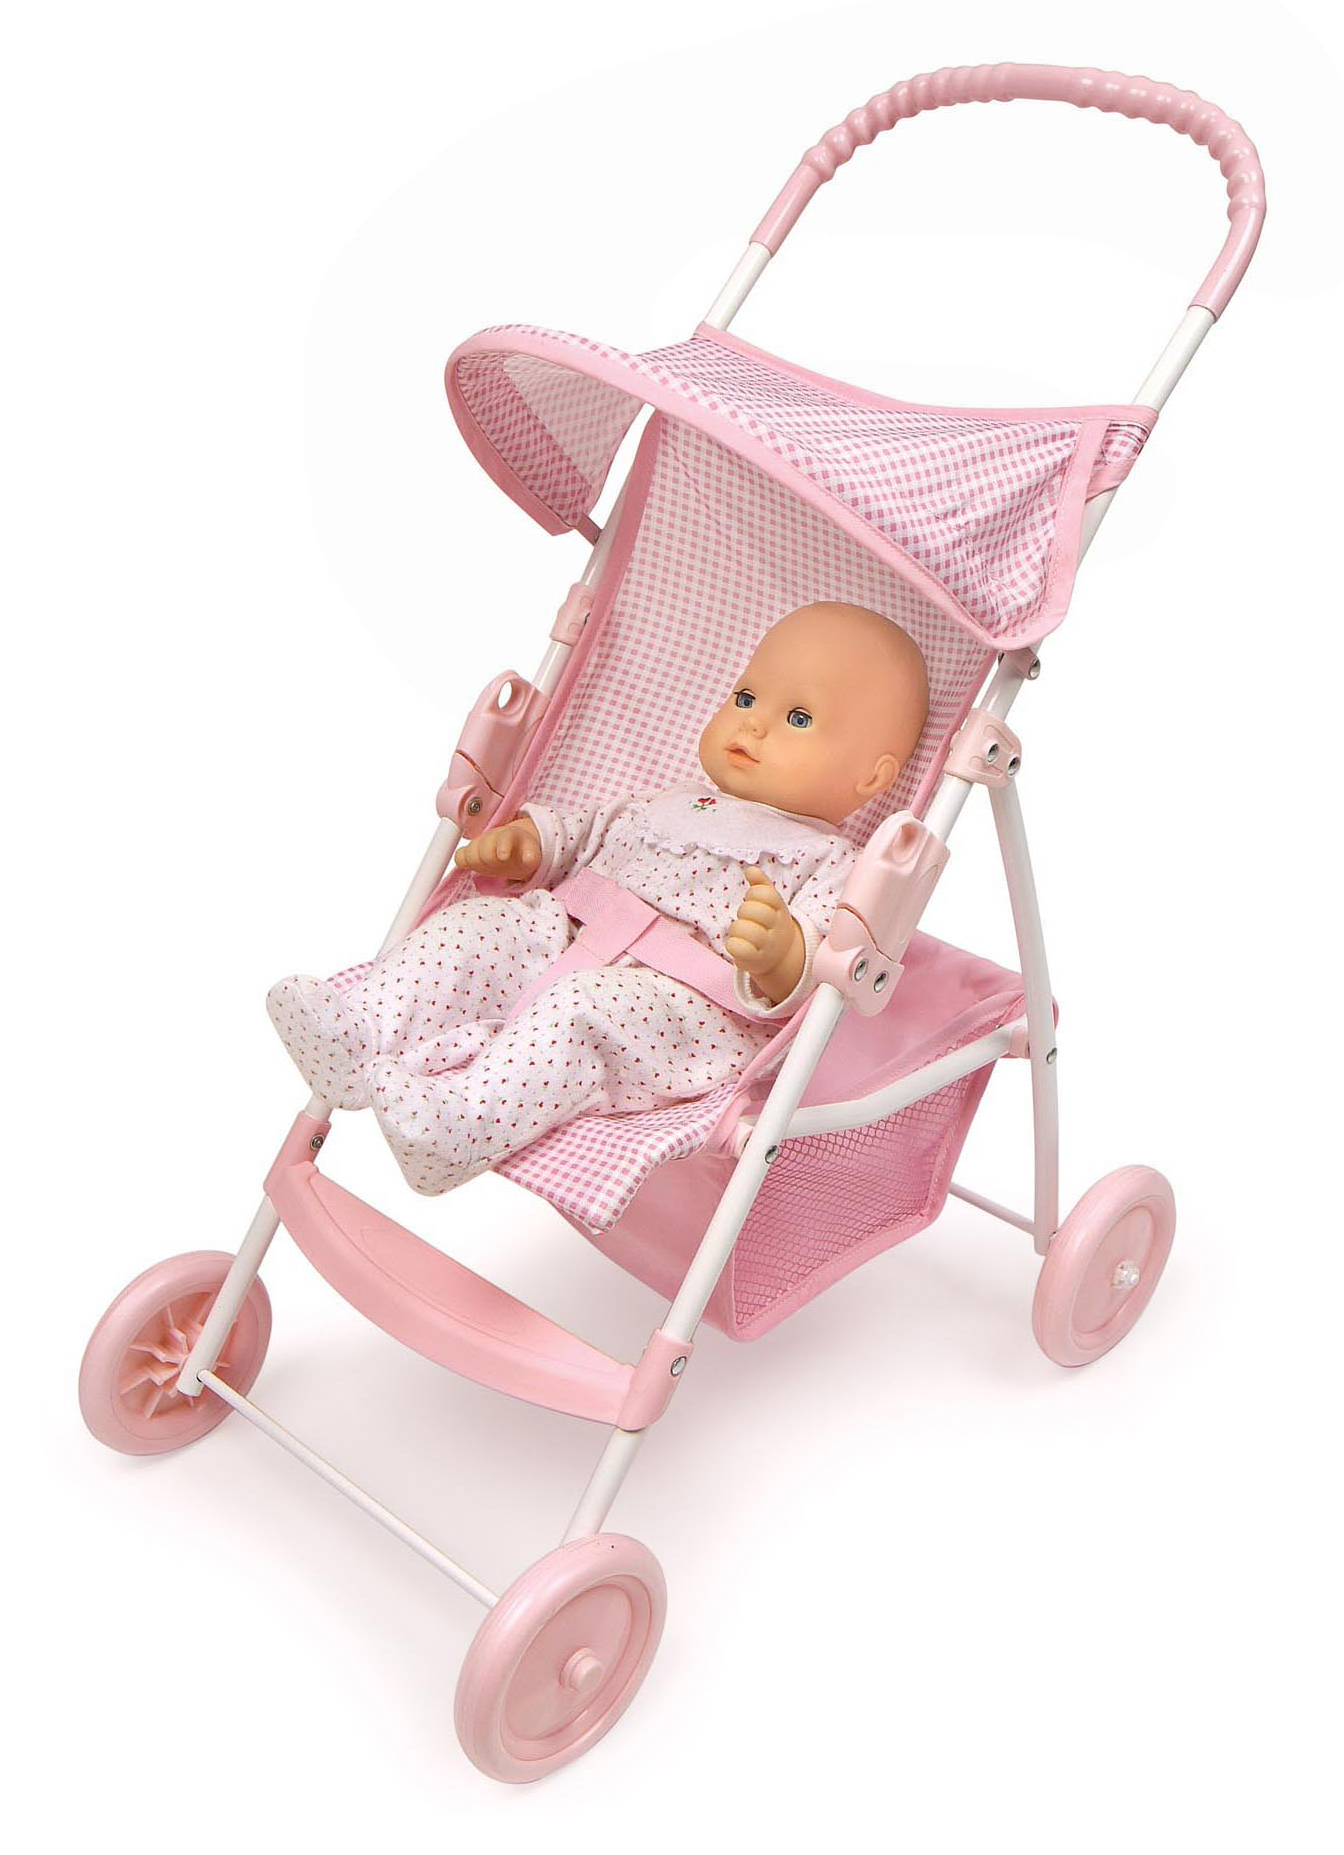 "Badger Basket Folding Doll Umbrella Stroller Pink Gingham Fits American Girl My Life As & Most 18"" Dolls Walmart"